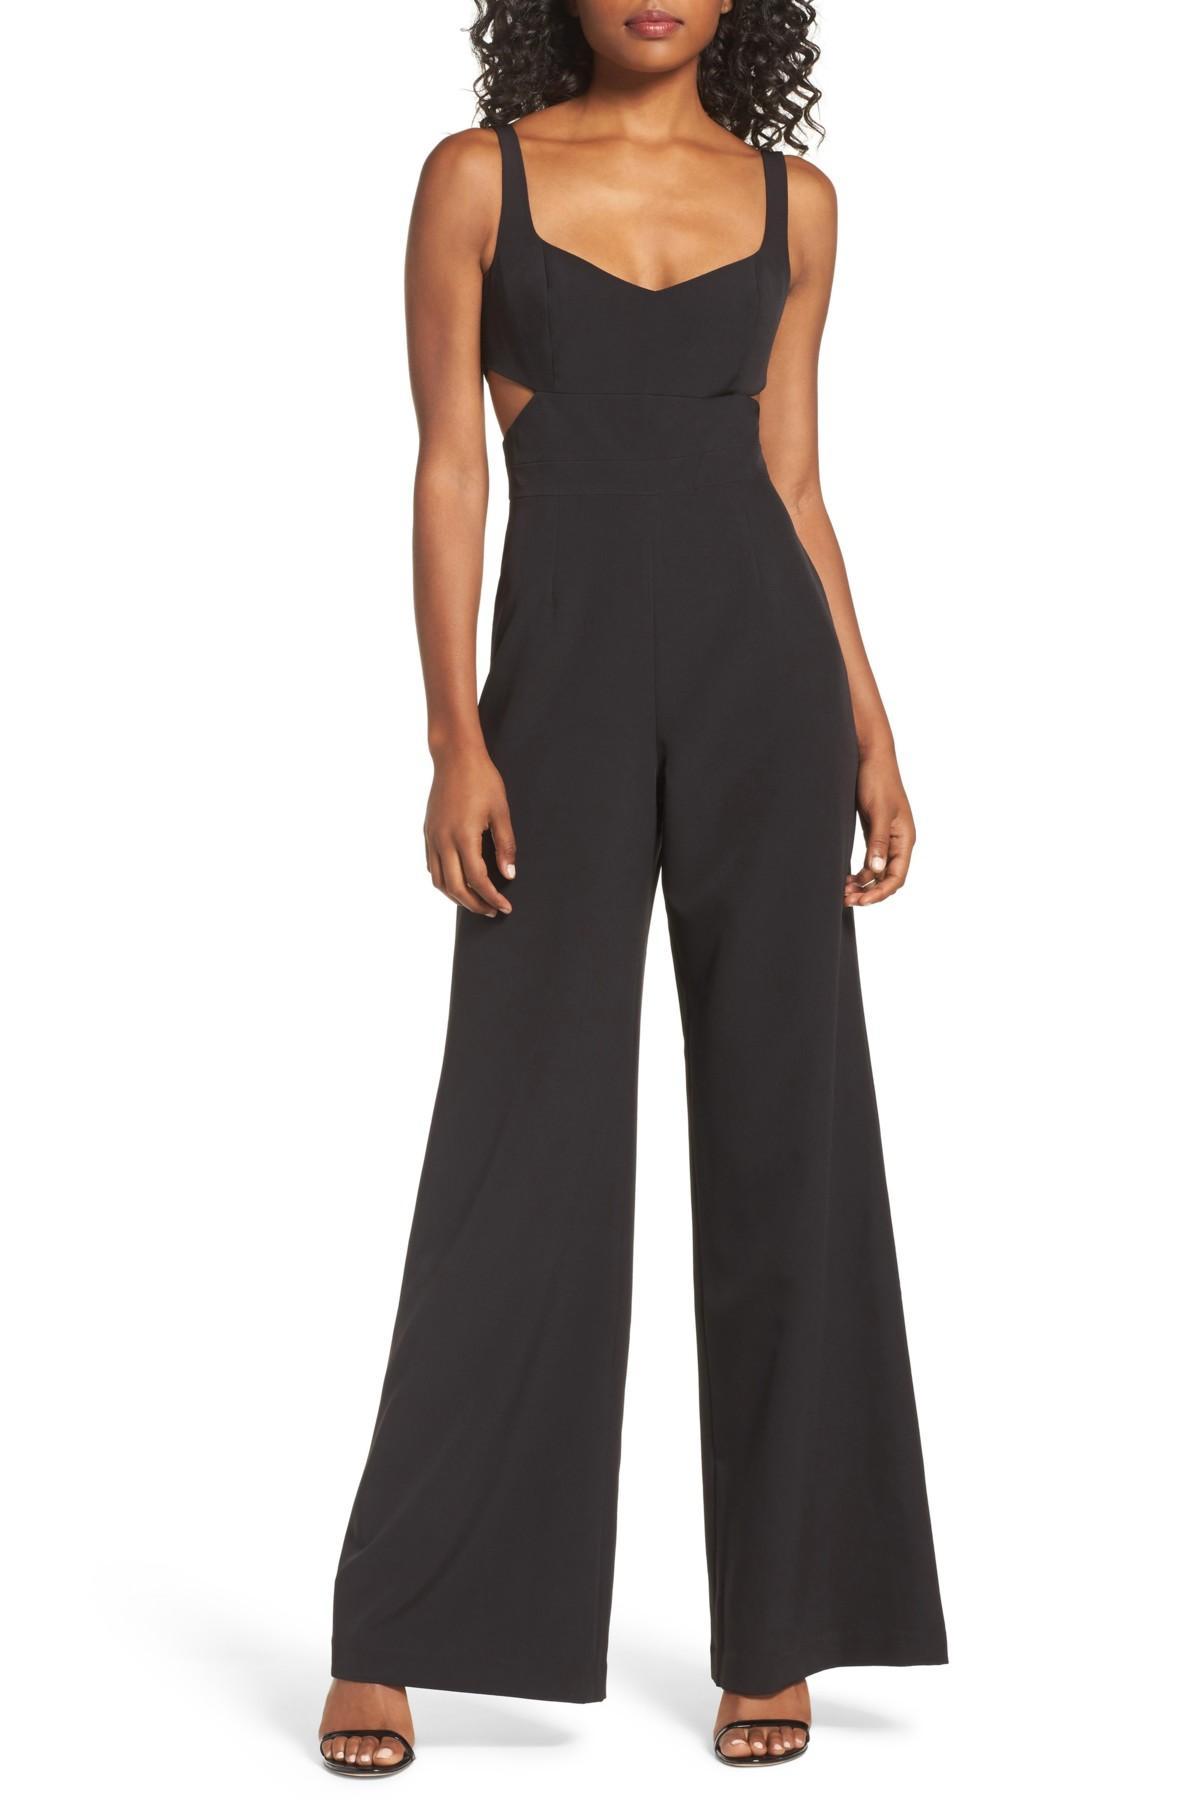 04a916fd3c55 Lyst - Jay Godfrey Daisy Side Cutout Jumpsuit in Black